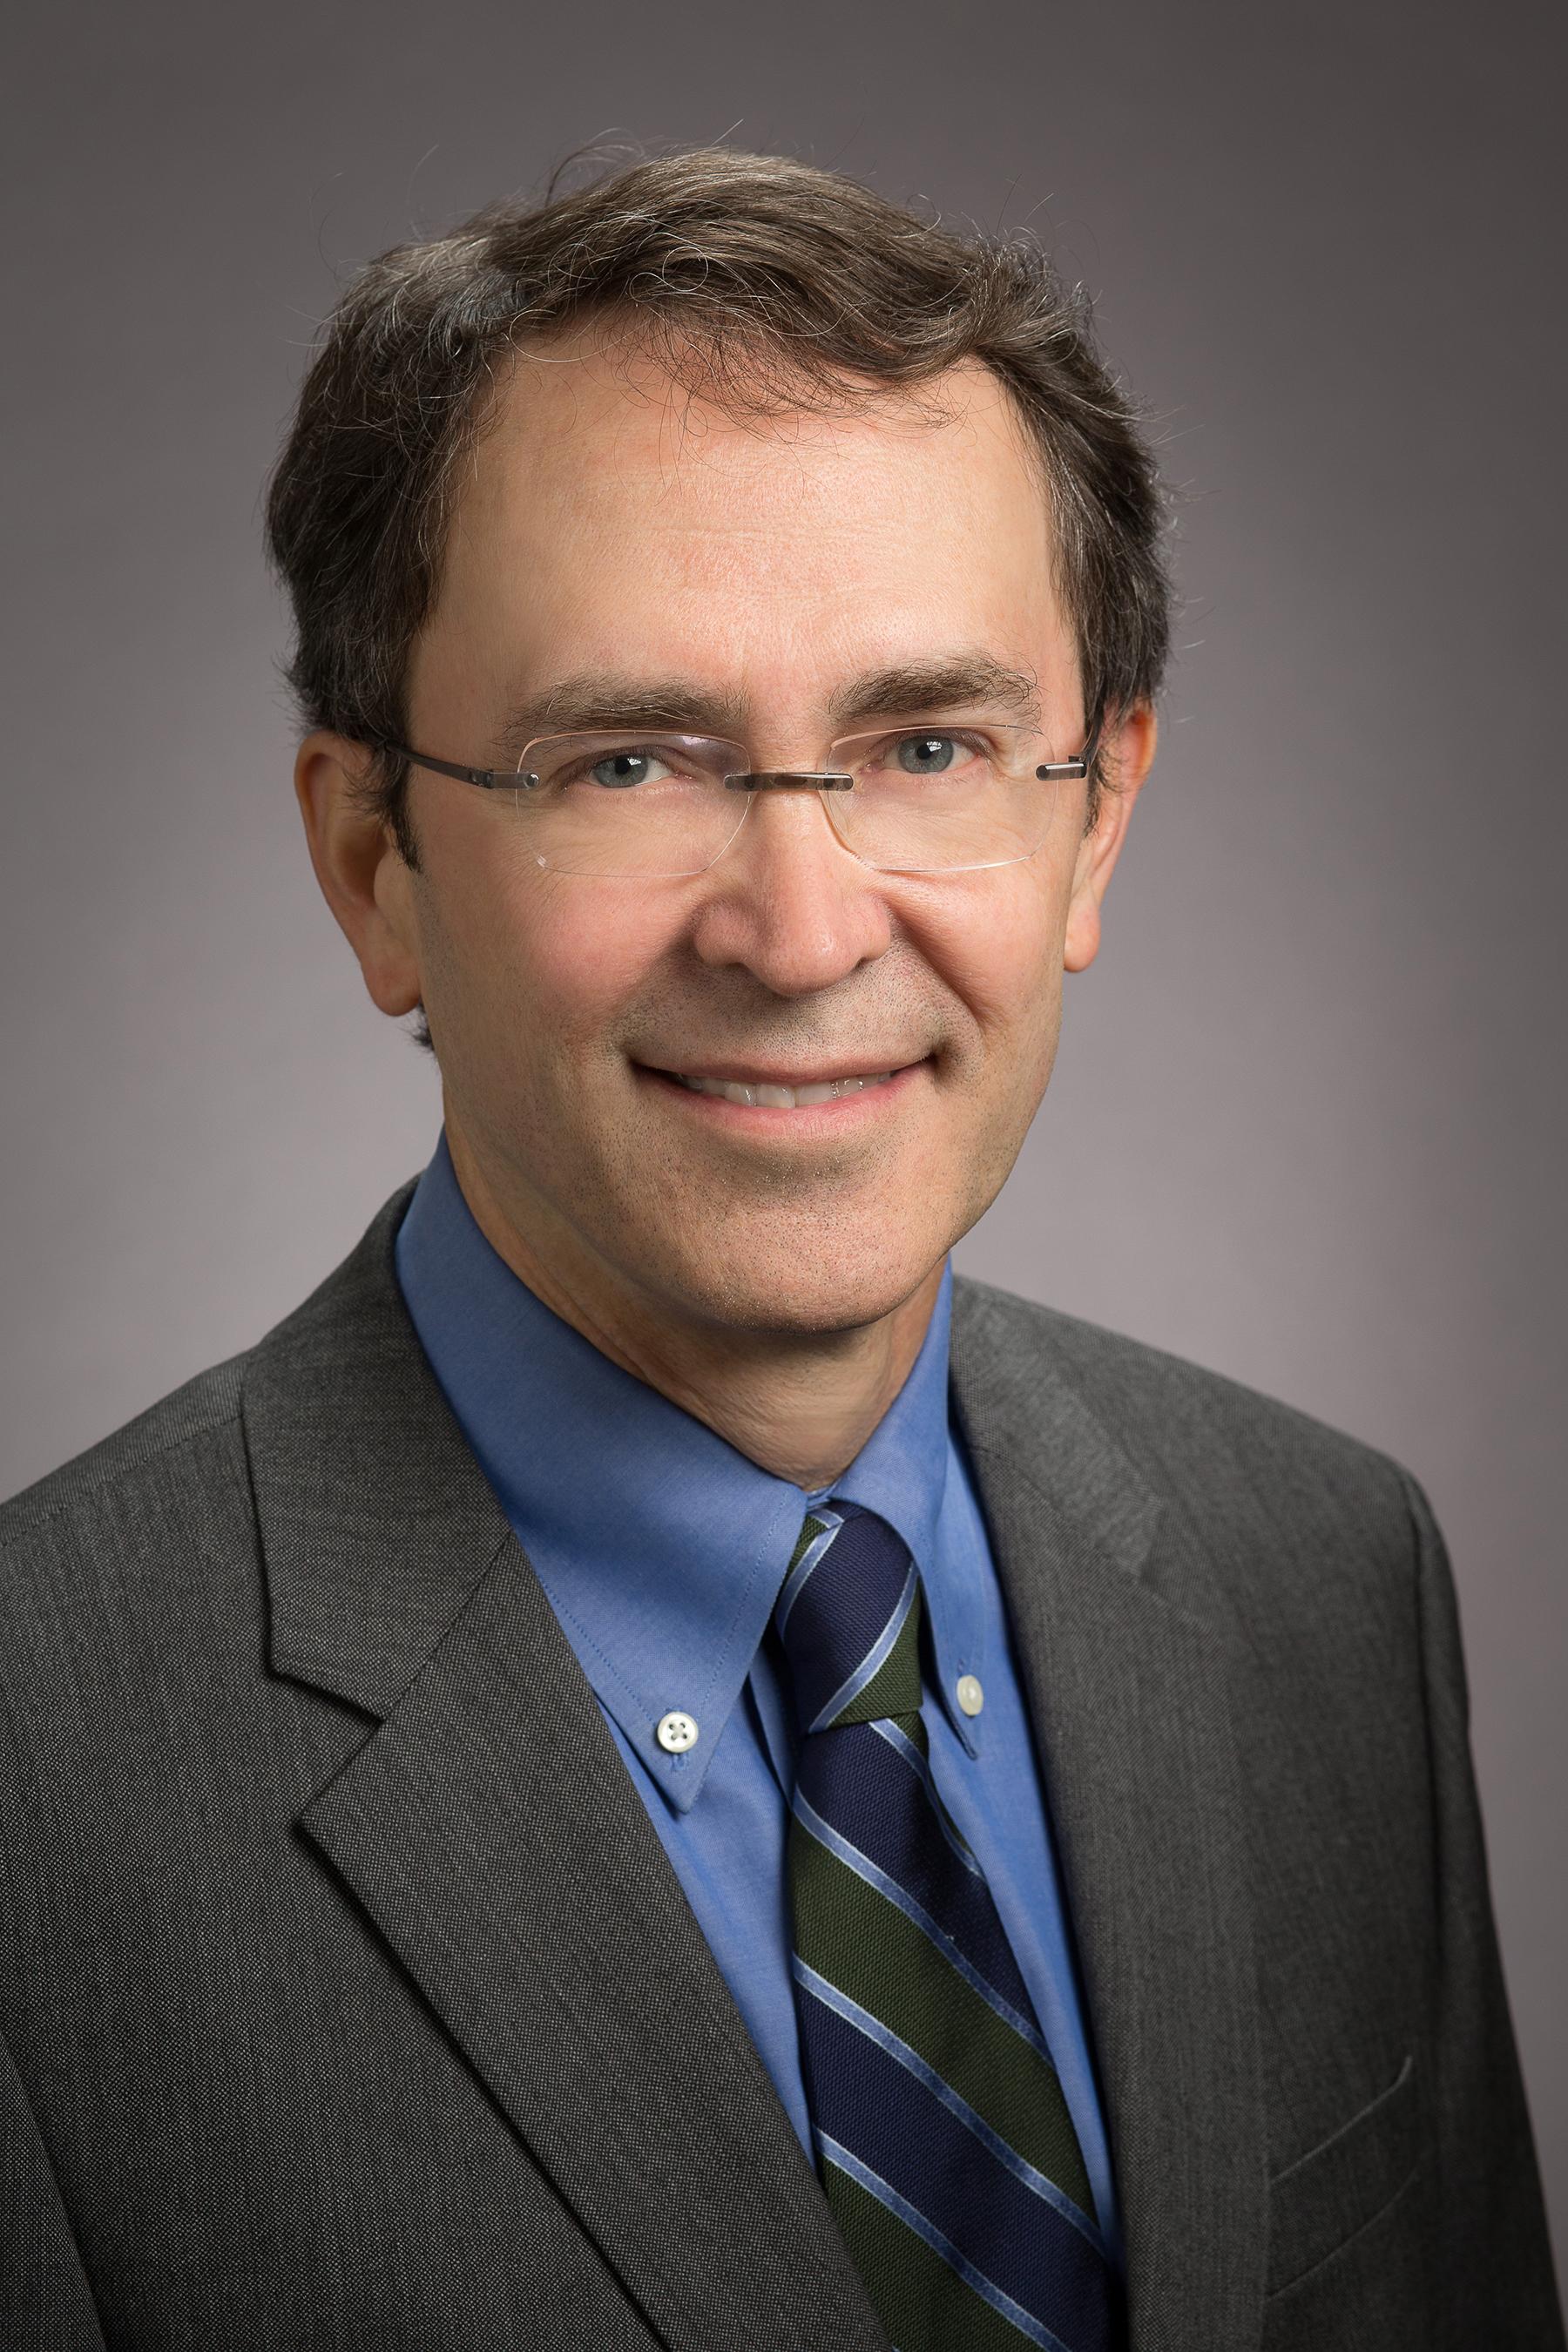 Hugh C. Hemmings, M.D., PhD, FRCA